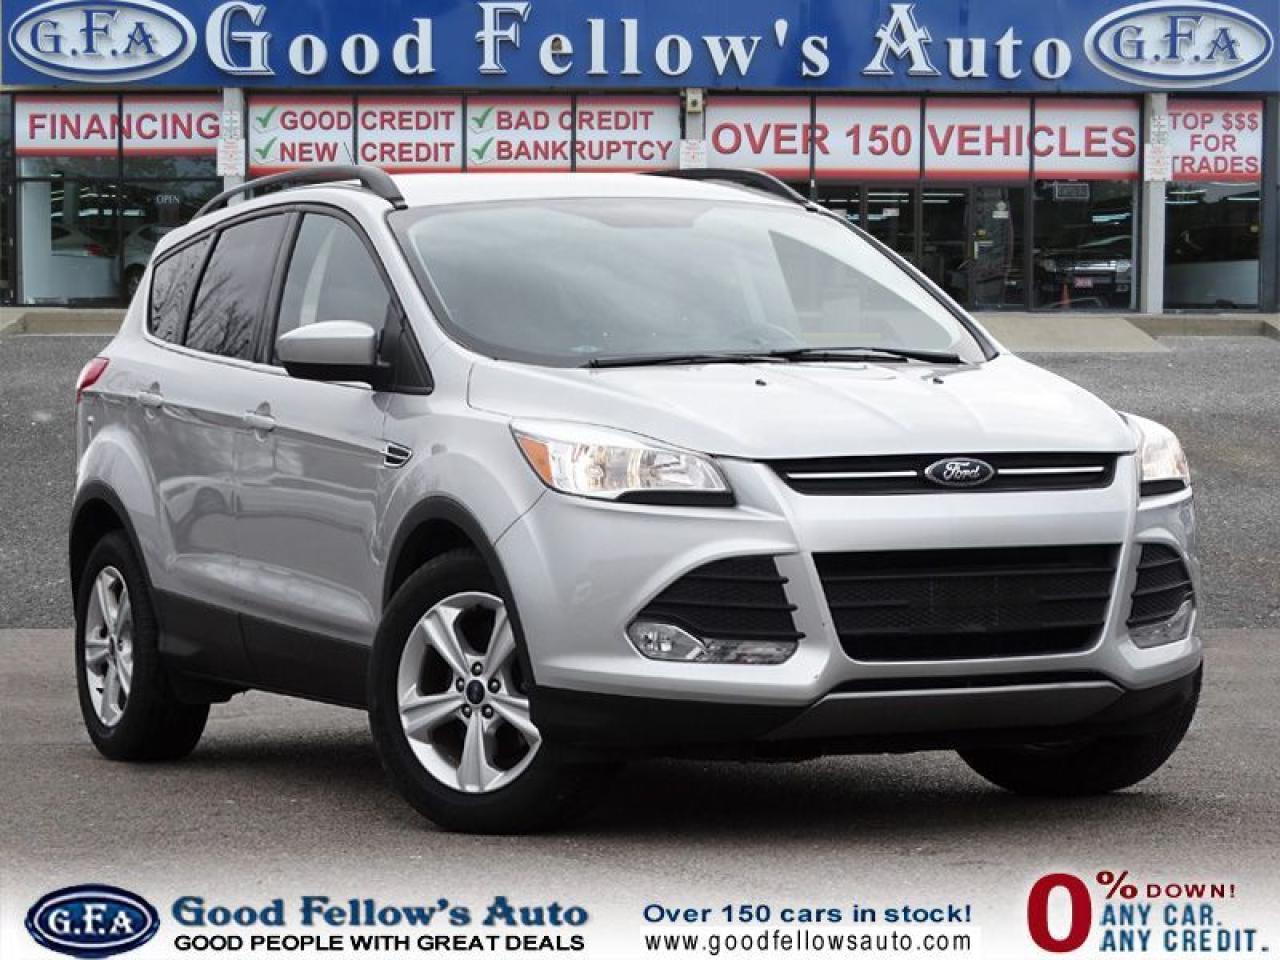 2015 Ford Escape SE MODEL, 1.6 L ECO, REARVIEW CAMERA, HEATED SEATS